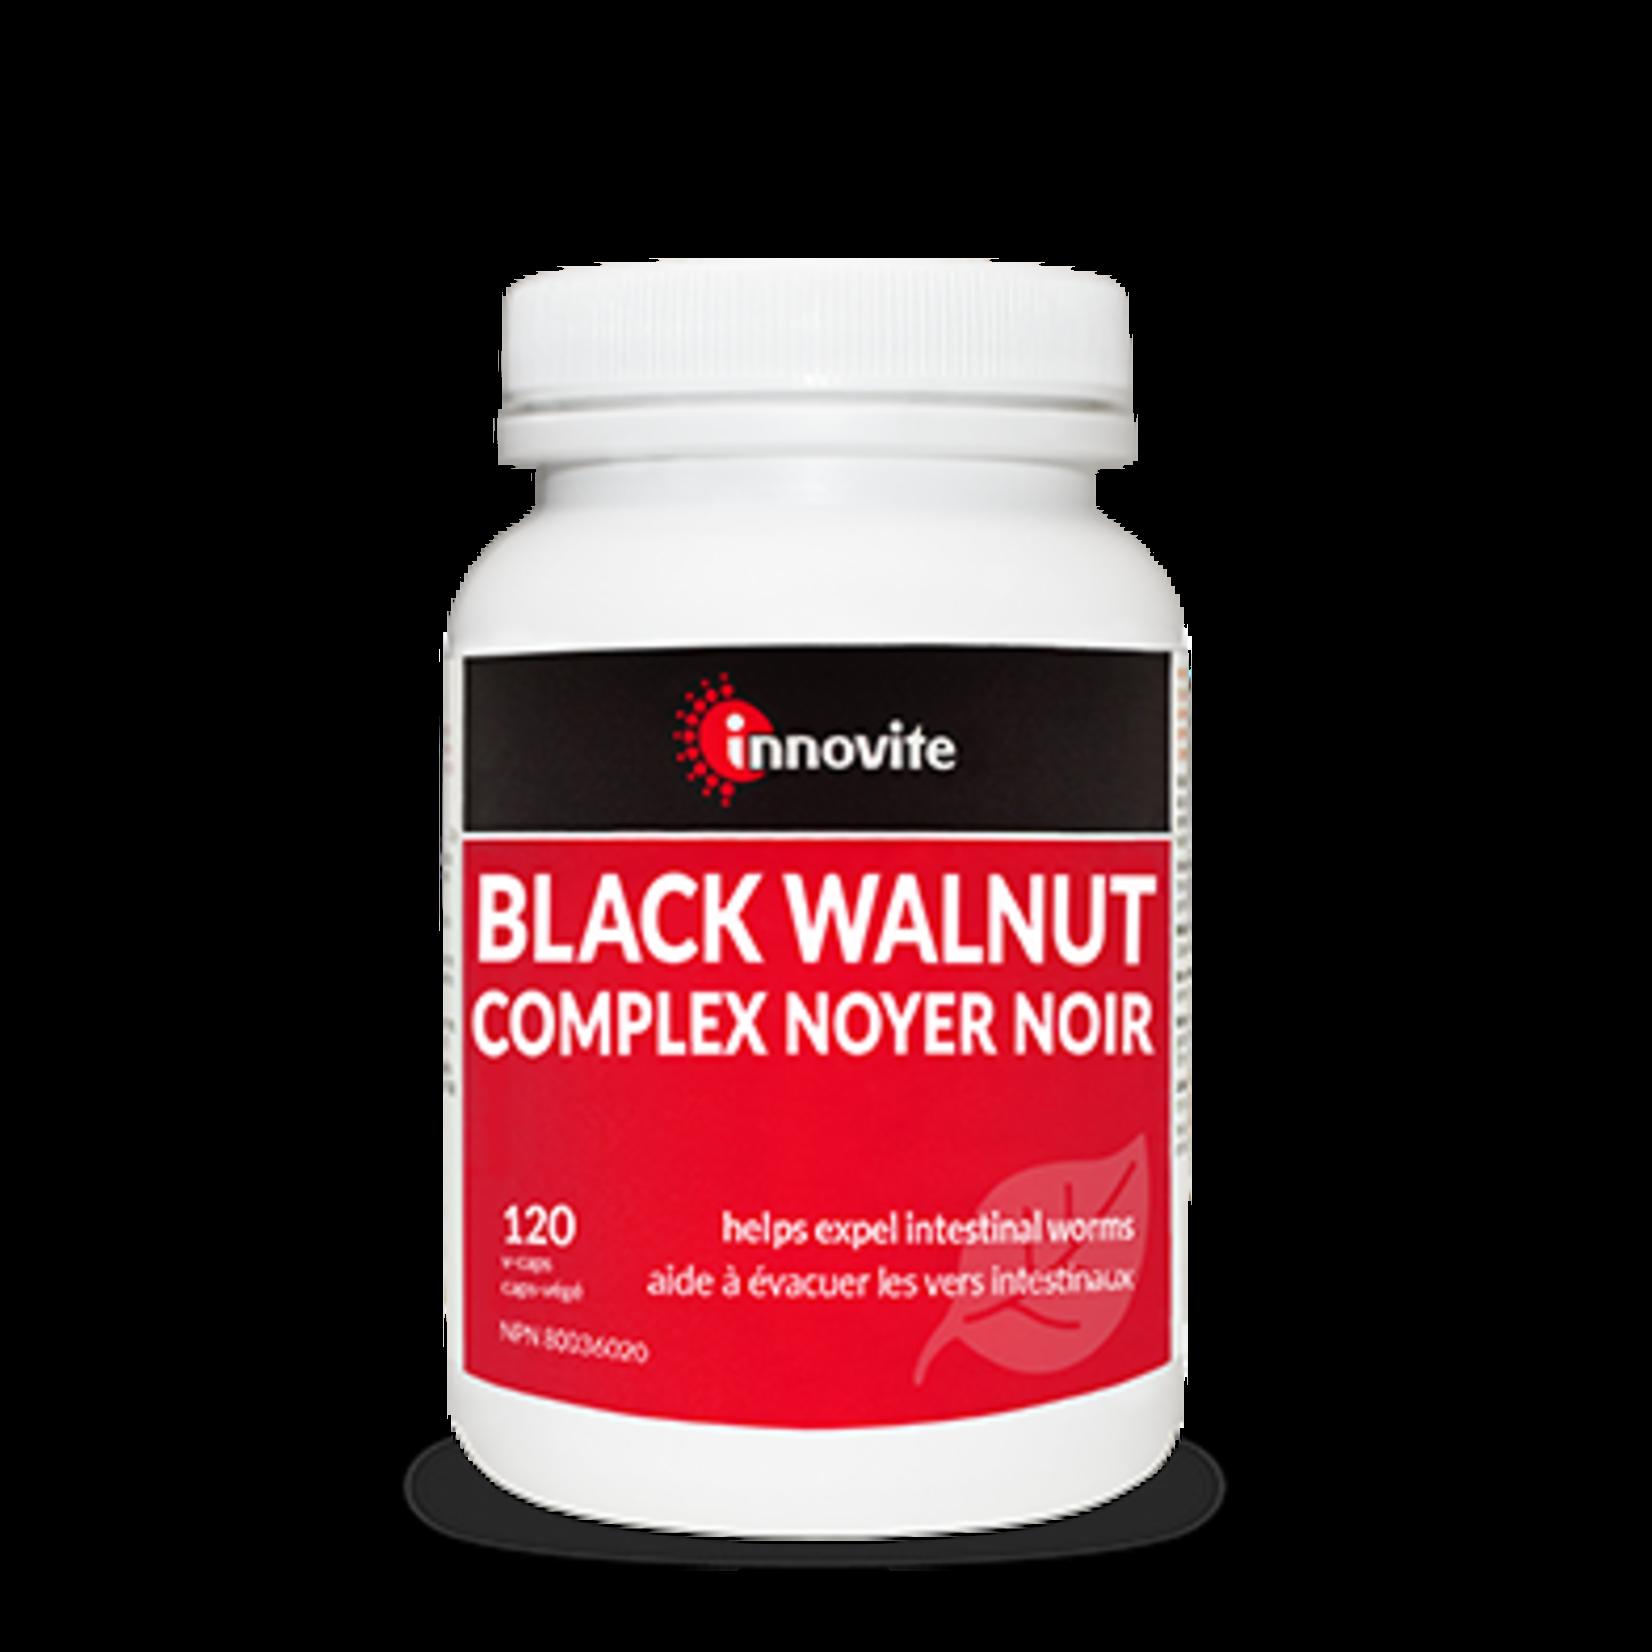 Innovite Black Walnut Complex 120 caps